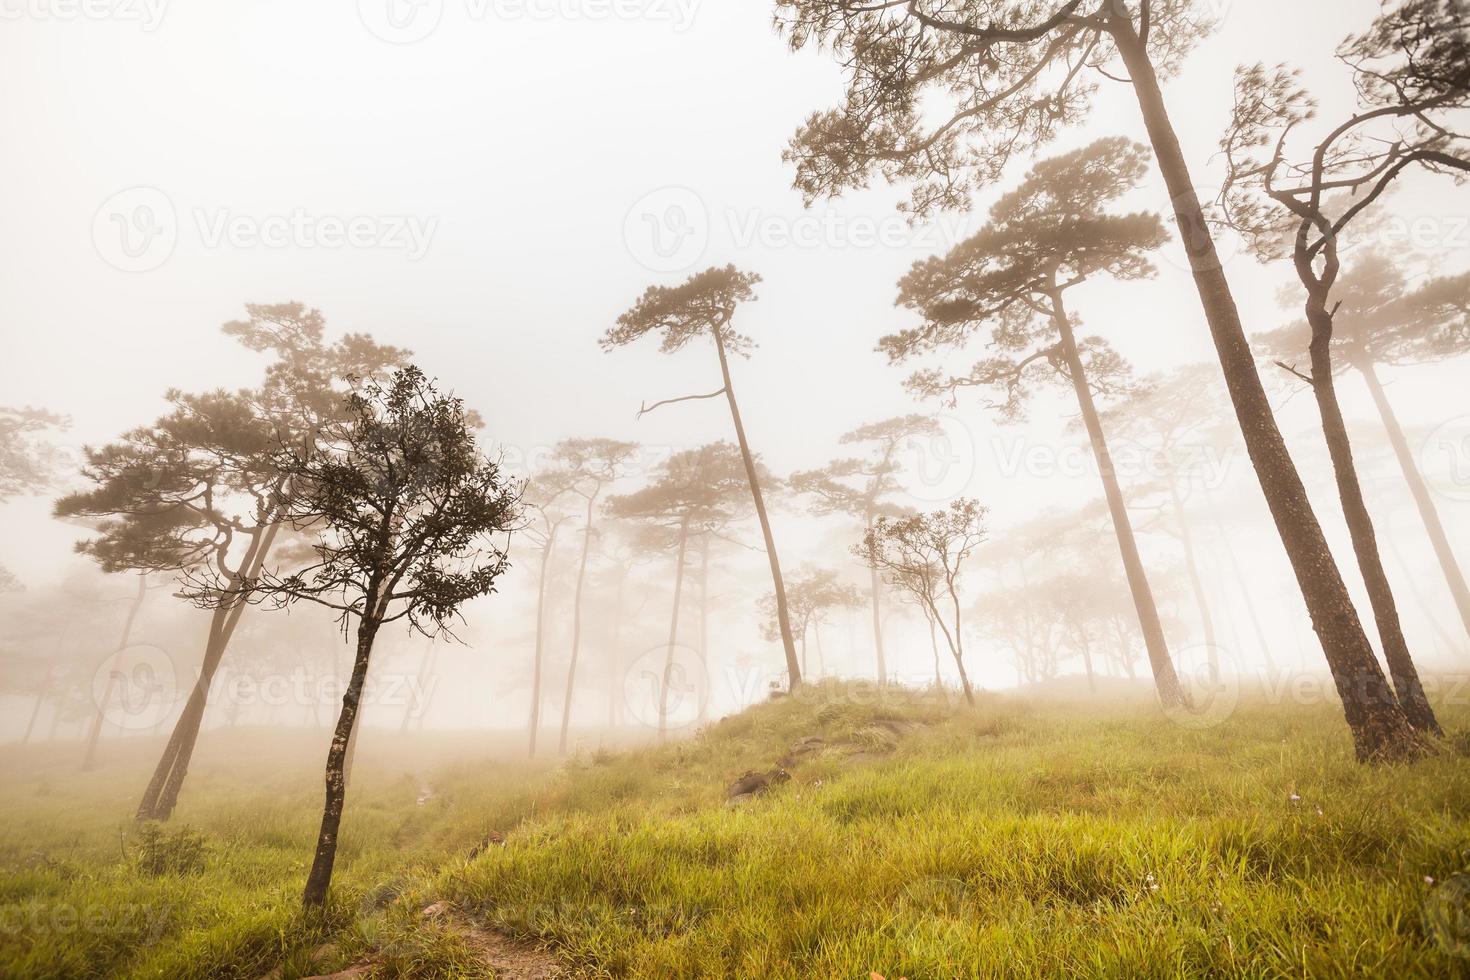 dennenbos gouden licht in de mist en regent mist foto